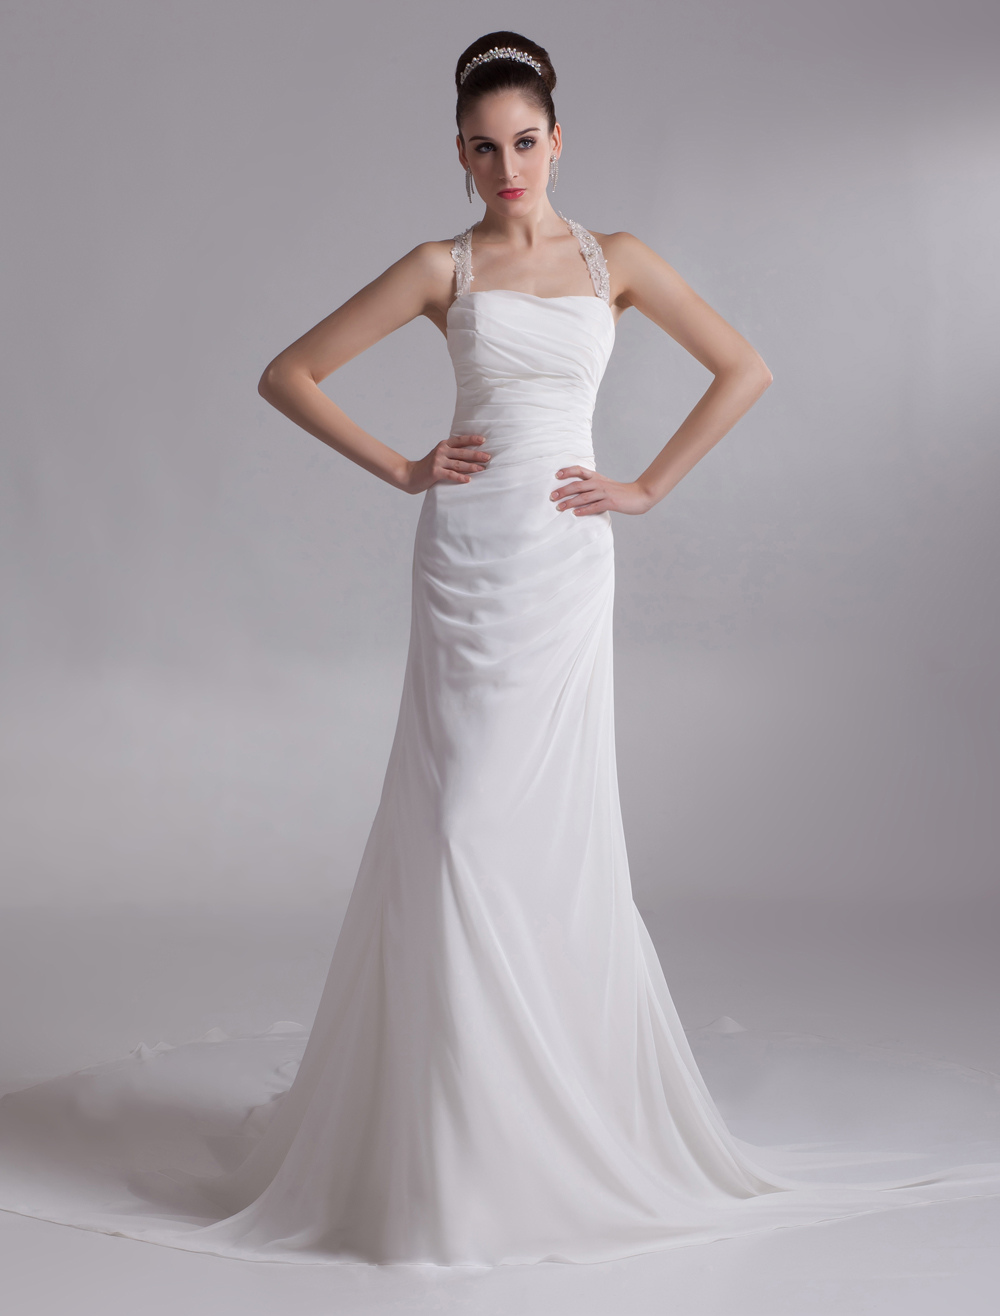 Halter Rhinestone Chiffon Bridal Wedding Dress photo